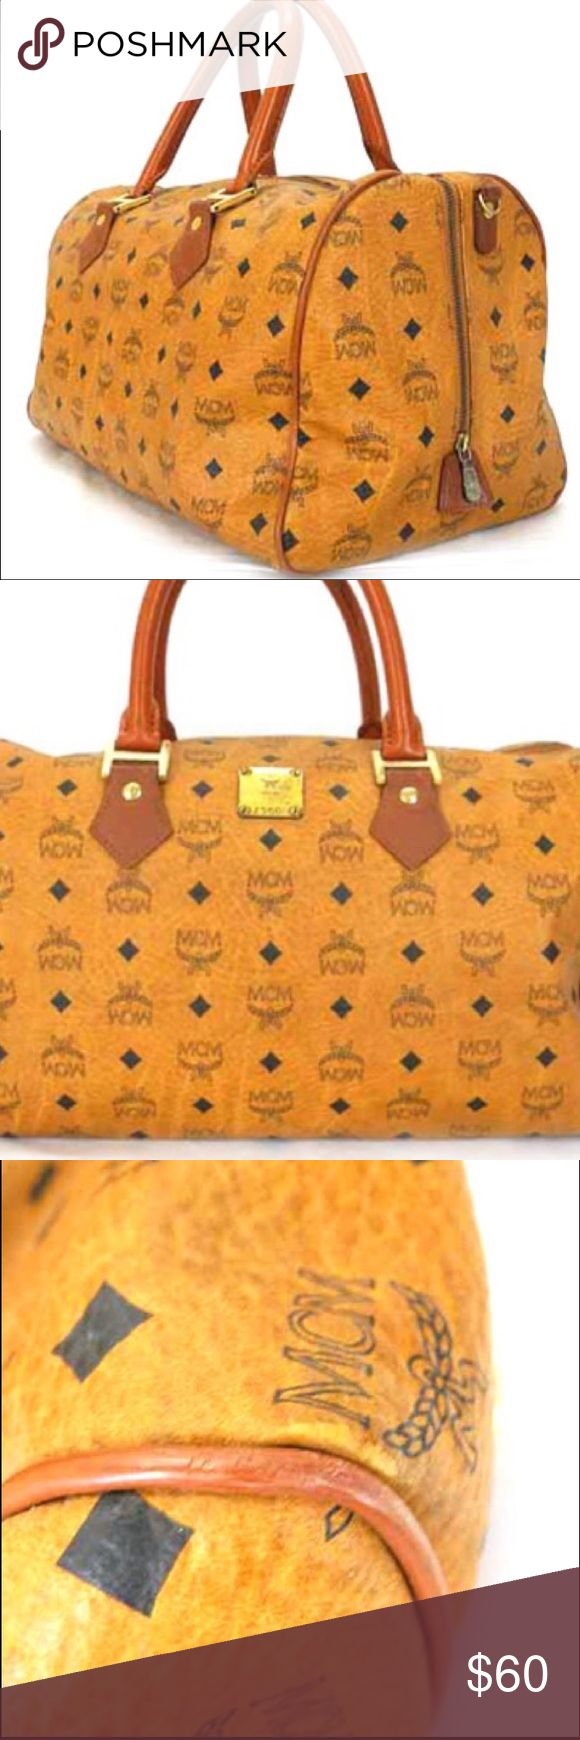 💖 Faux MCM Speedy style handbag Very nice 💖 💖 Faux MCM Speedy style handbag Very nice 💖 Bags